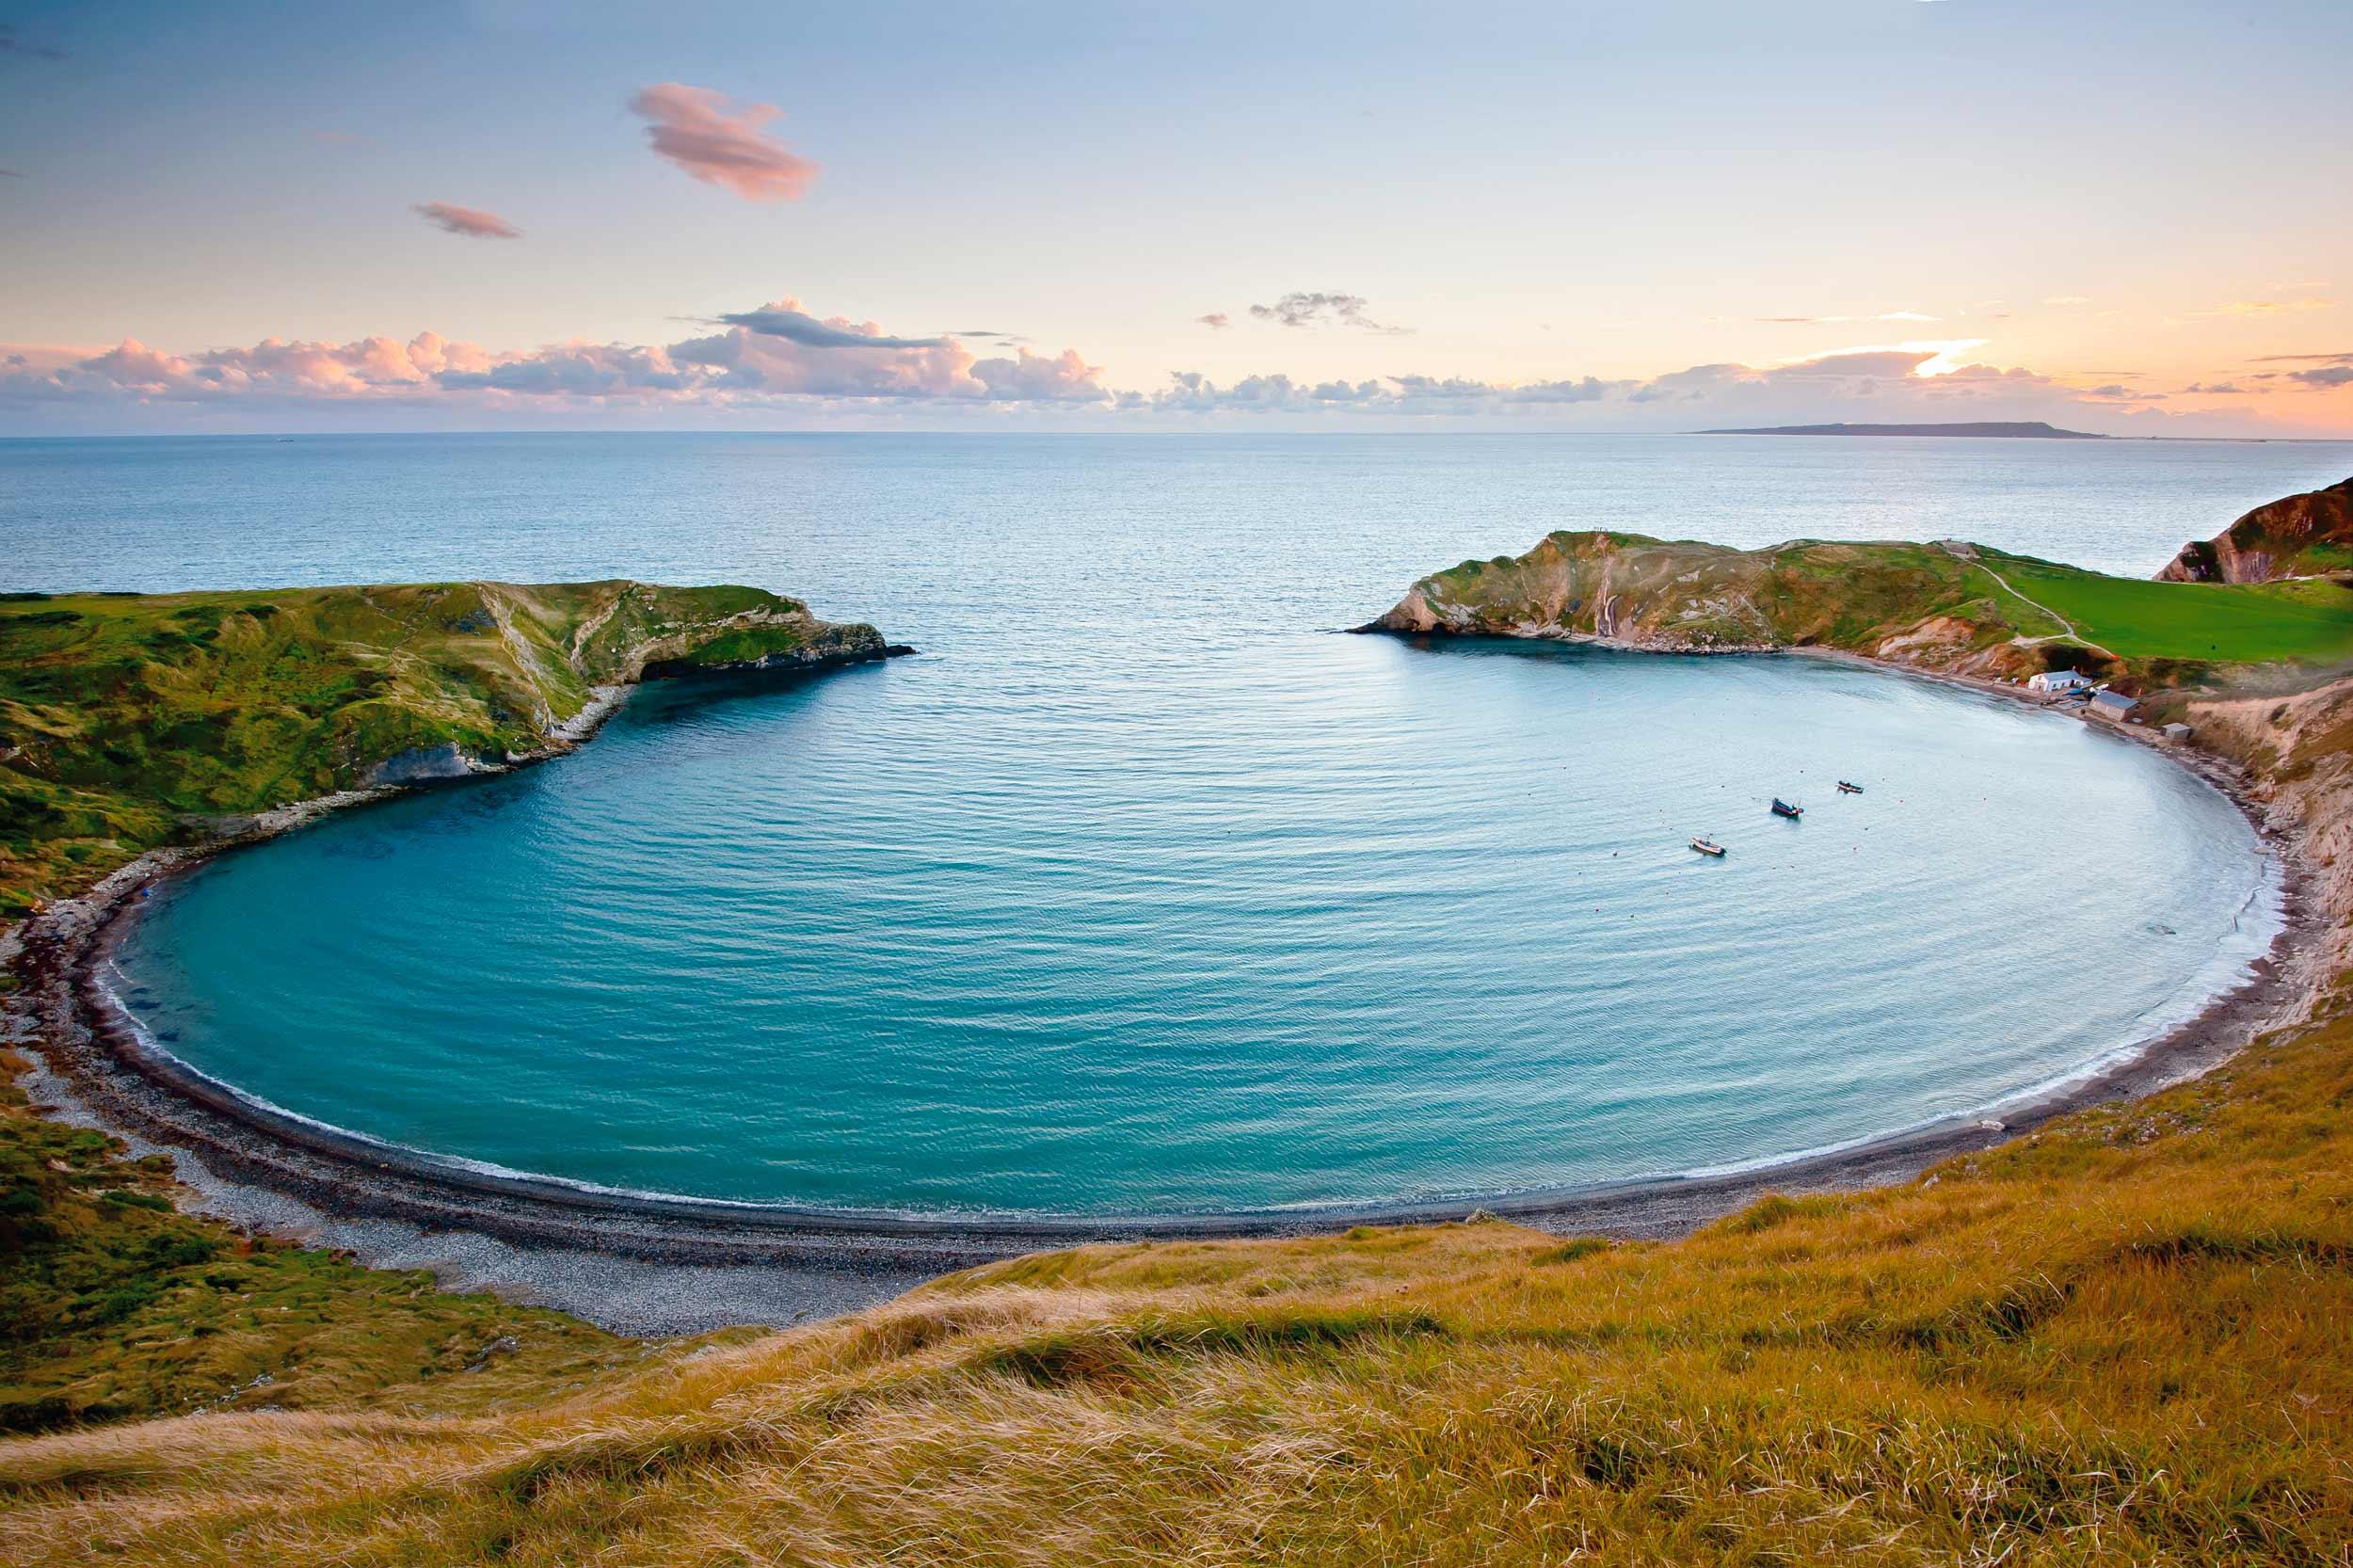 Lulworth Cove, Dorset  (Chris Button/Shutterstock)